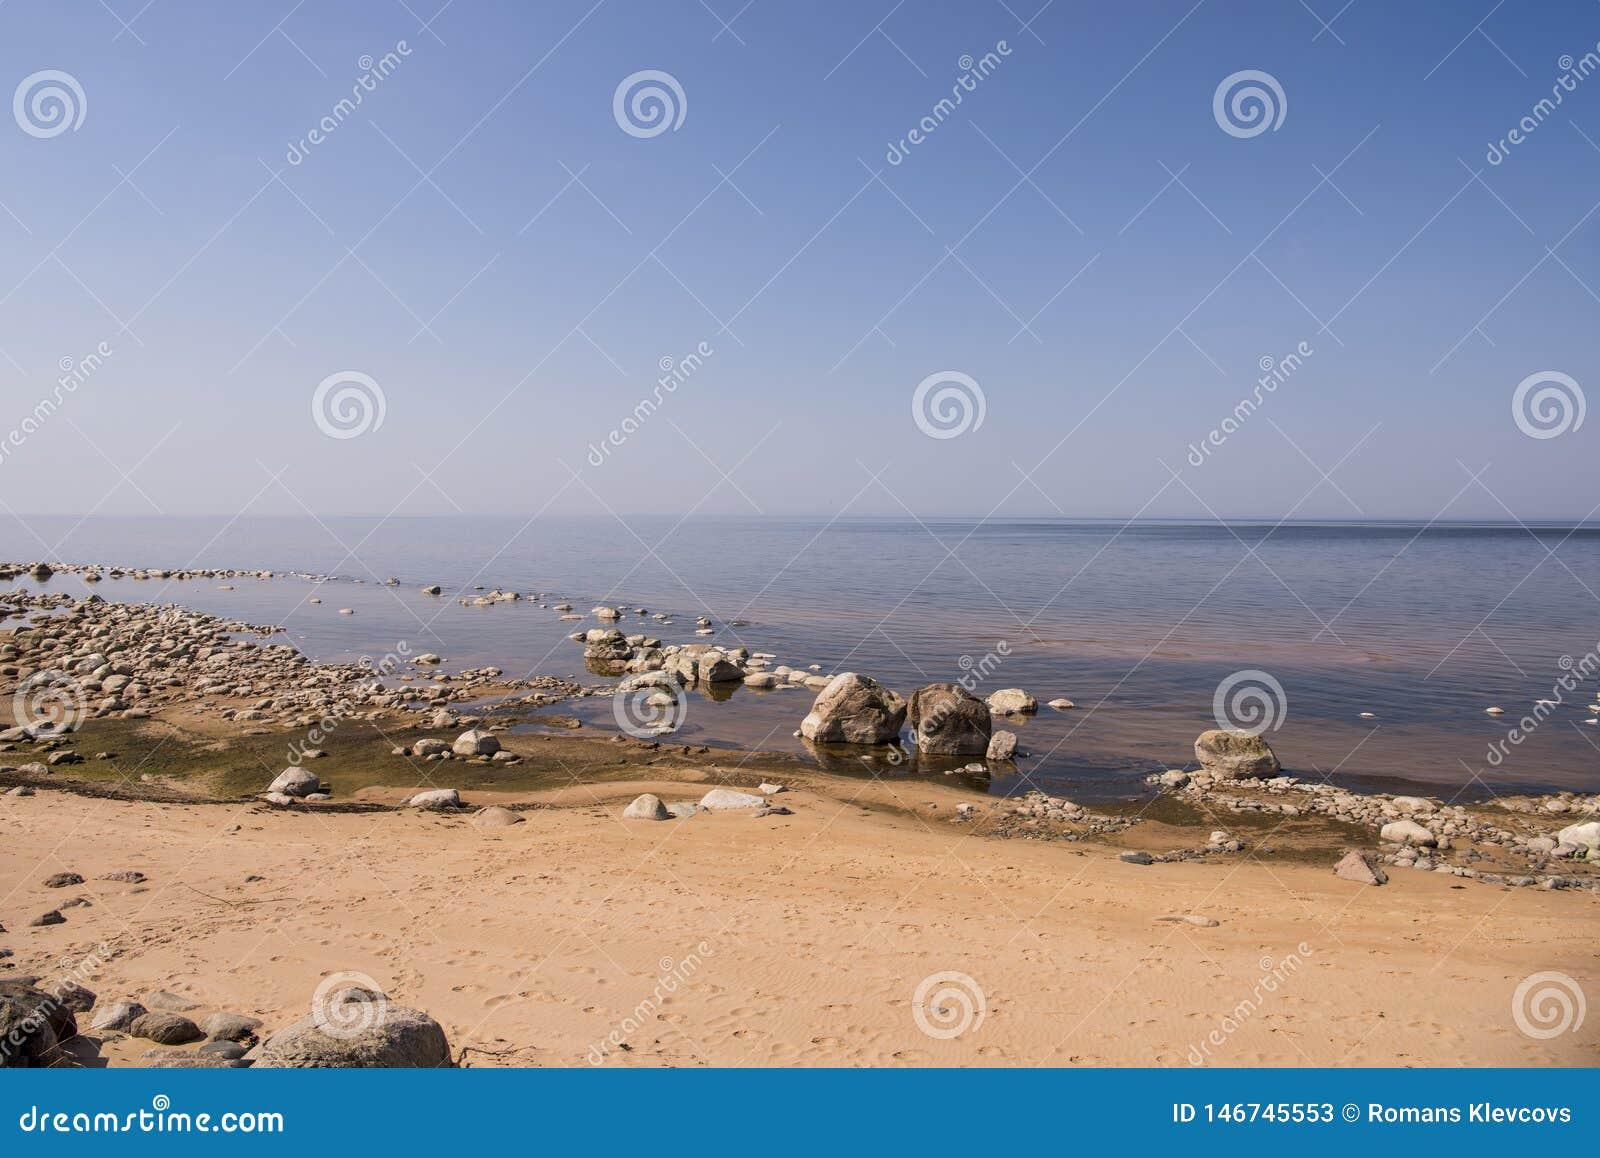 Stones balance on the beach. Place on Latvian coasts called Veczemju klintis